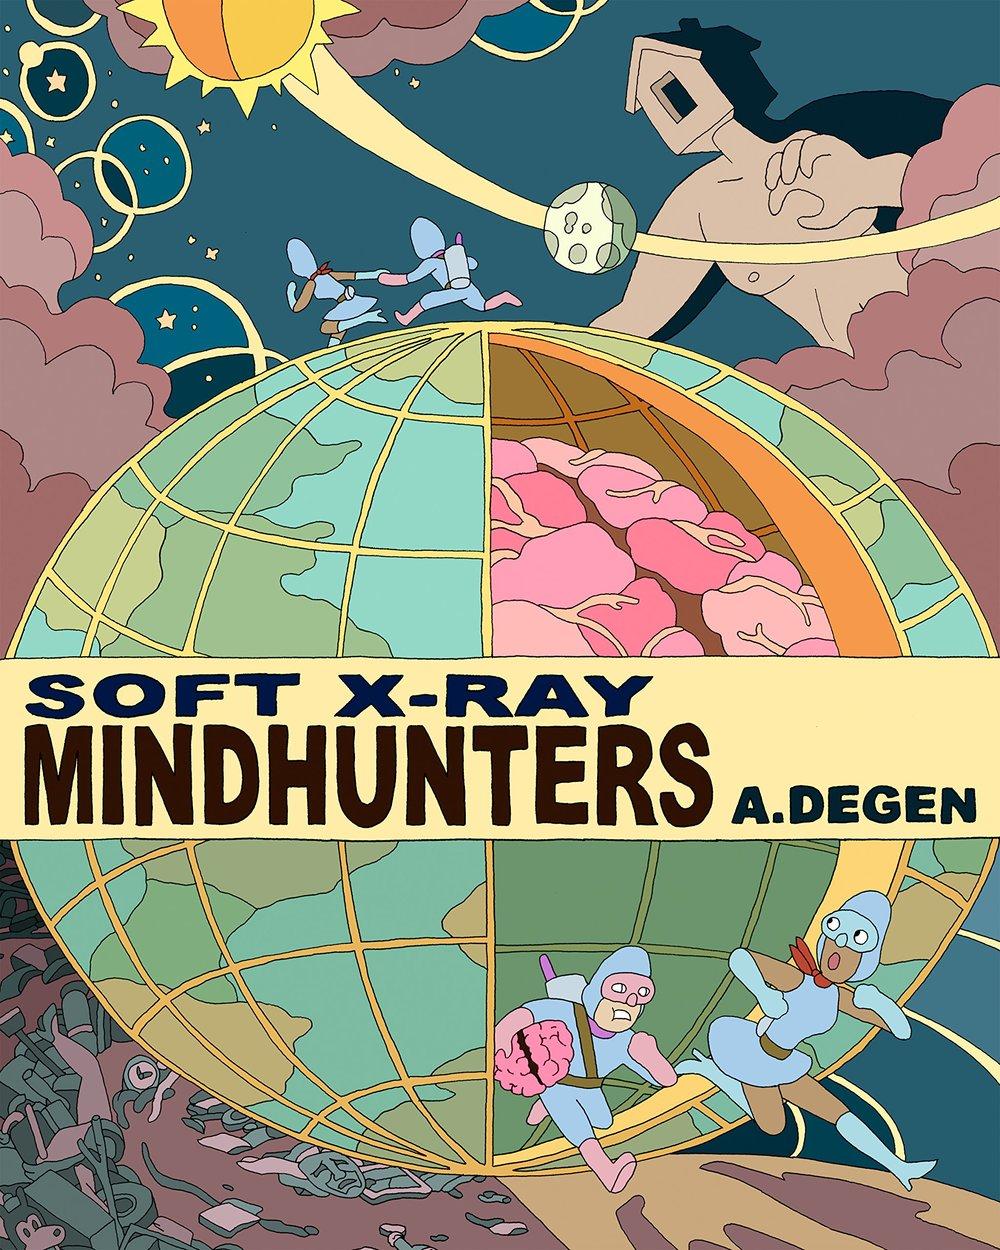 - 4. Soft X-Ray Mindhunters by A. Degen (Koyama)